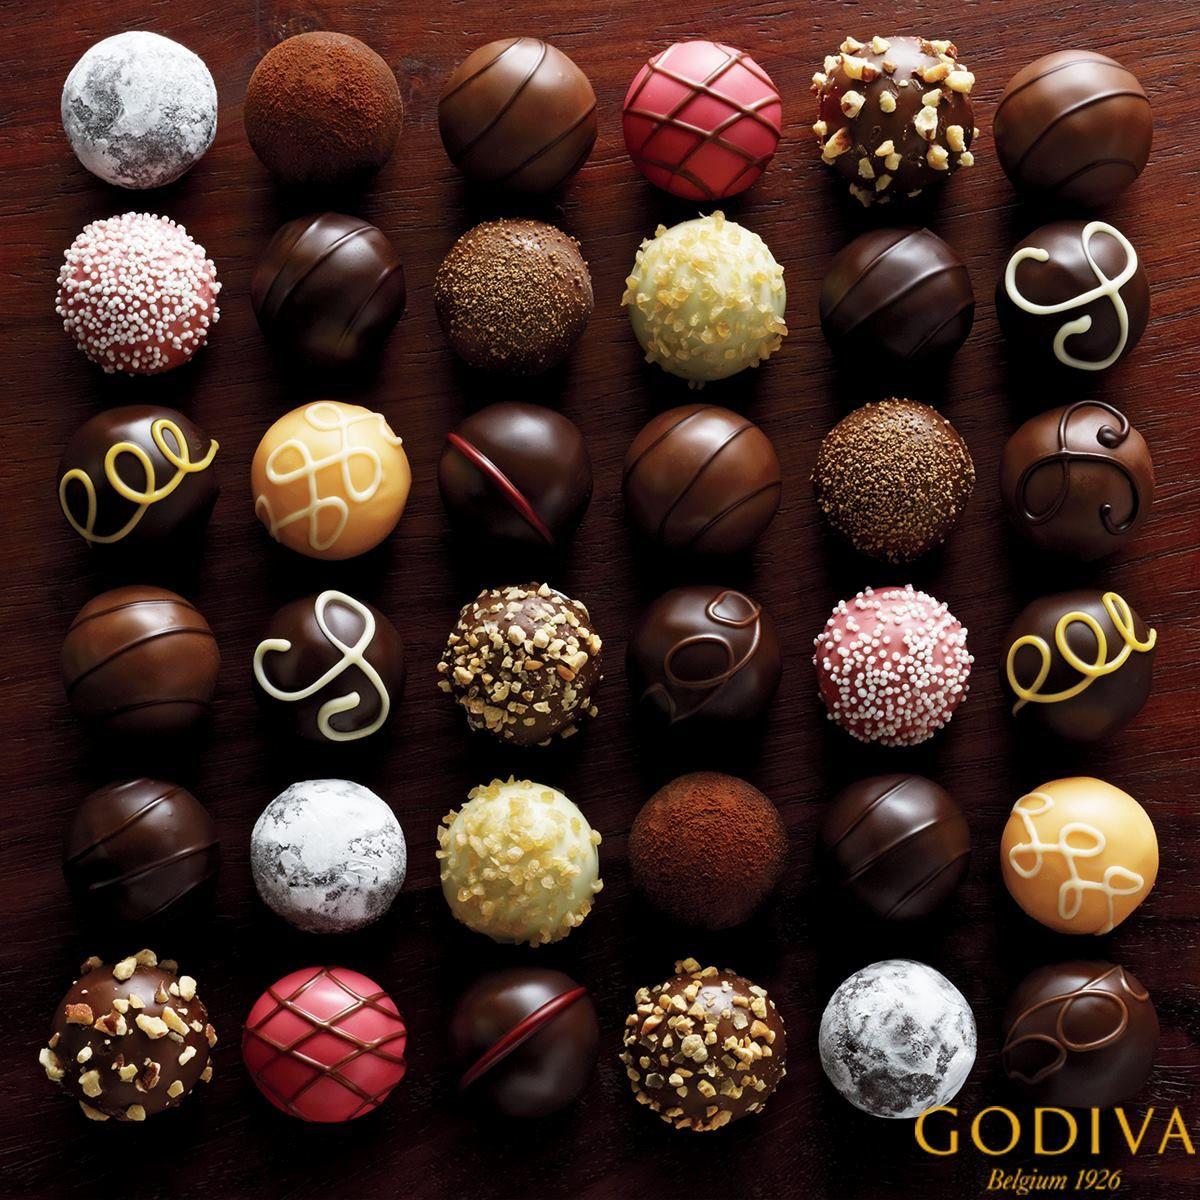 Godiva Truffles | F O O D | Pinterest | Truffle, Chocolate and ...